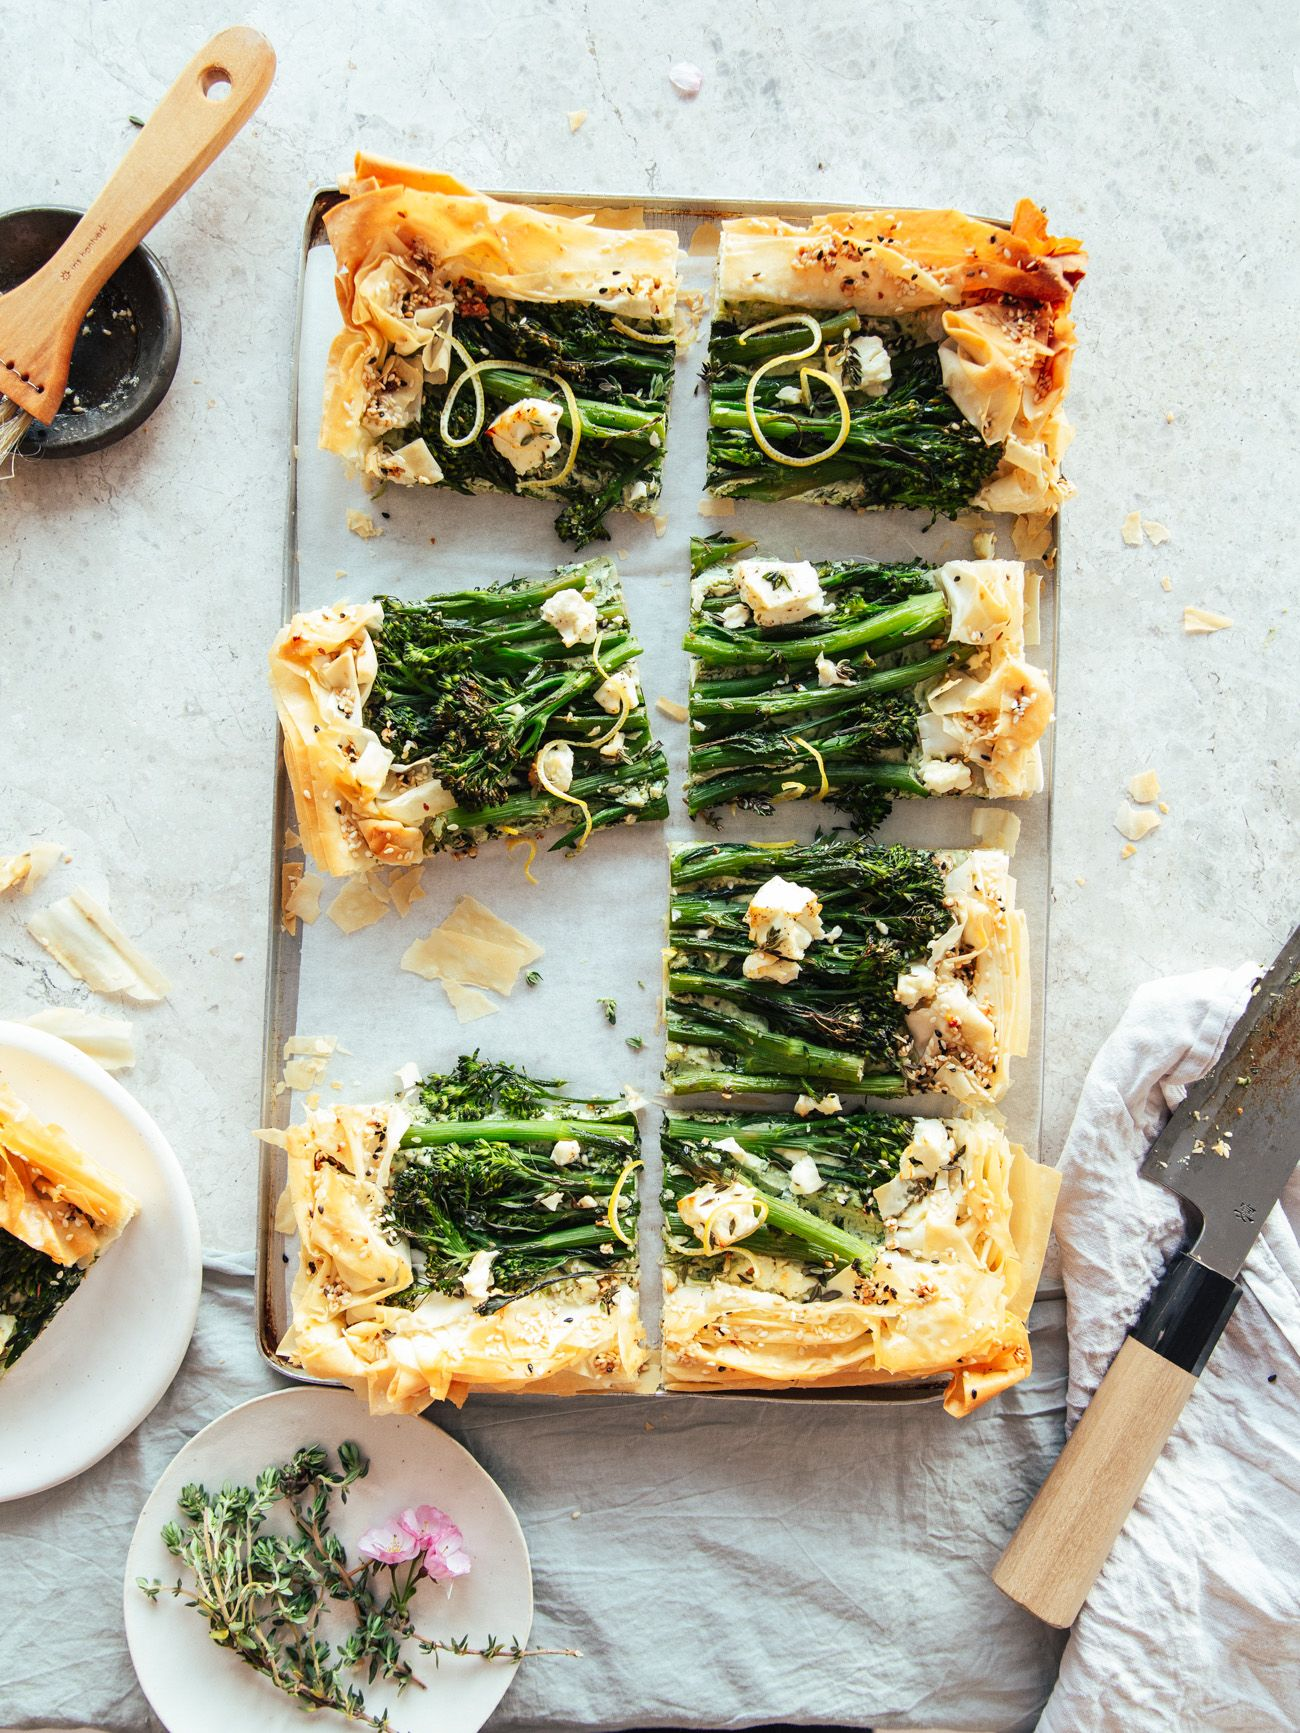 filo tart with broccoli ricotta izy hossack top with cinnamon recipe filo pastry recipes food filo pastry recipes savoury pinterest